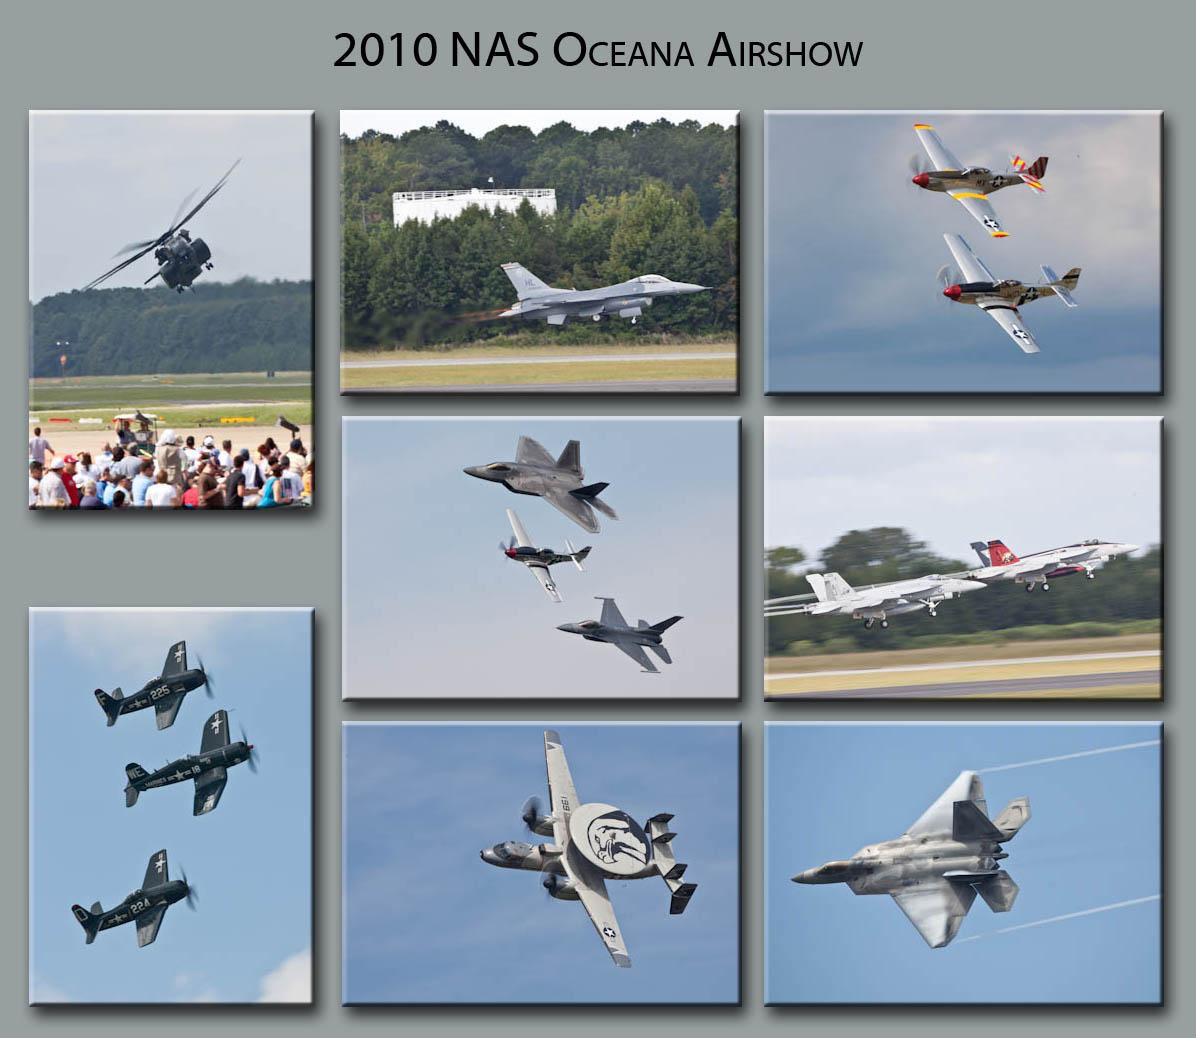 IMAGE: http://www.lowbyte.com/pix/web-NasOceana2010-ThumbsPg.jpg